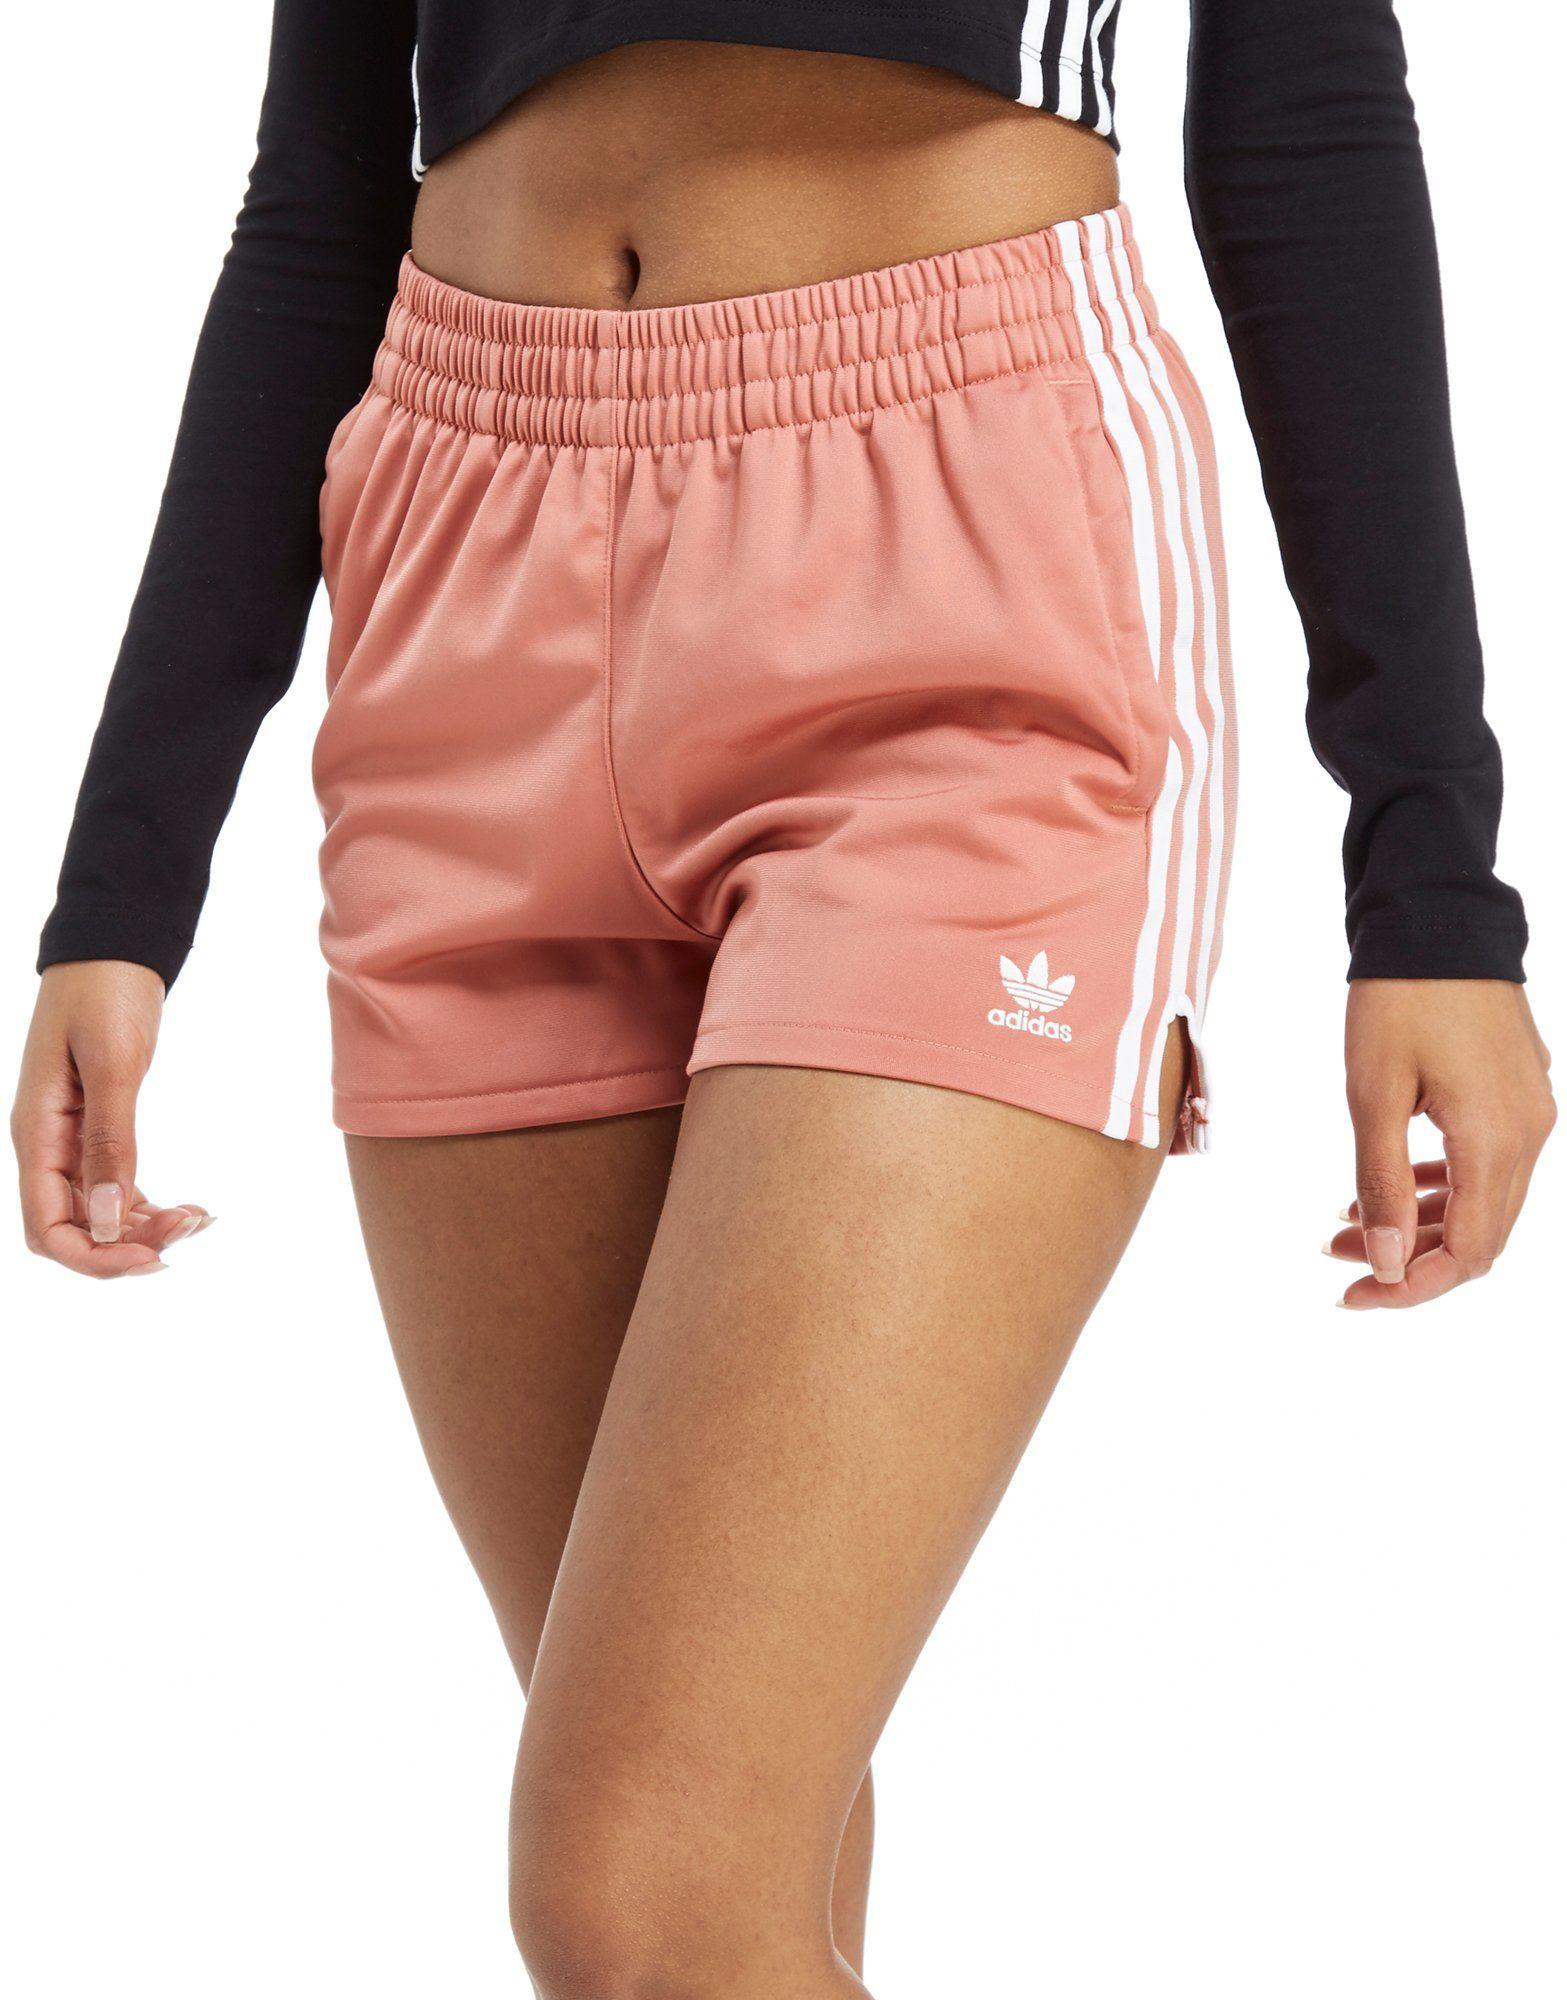 5401756c4e7 adidas Originals 3-Stripe Poly Shorts - Shop online for adidas Originals 3- Stripe Poly Shorts with JD Sports, the UK's leading sports fashion retailer.